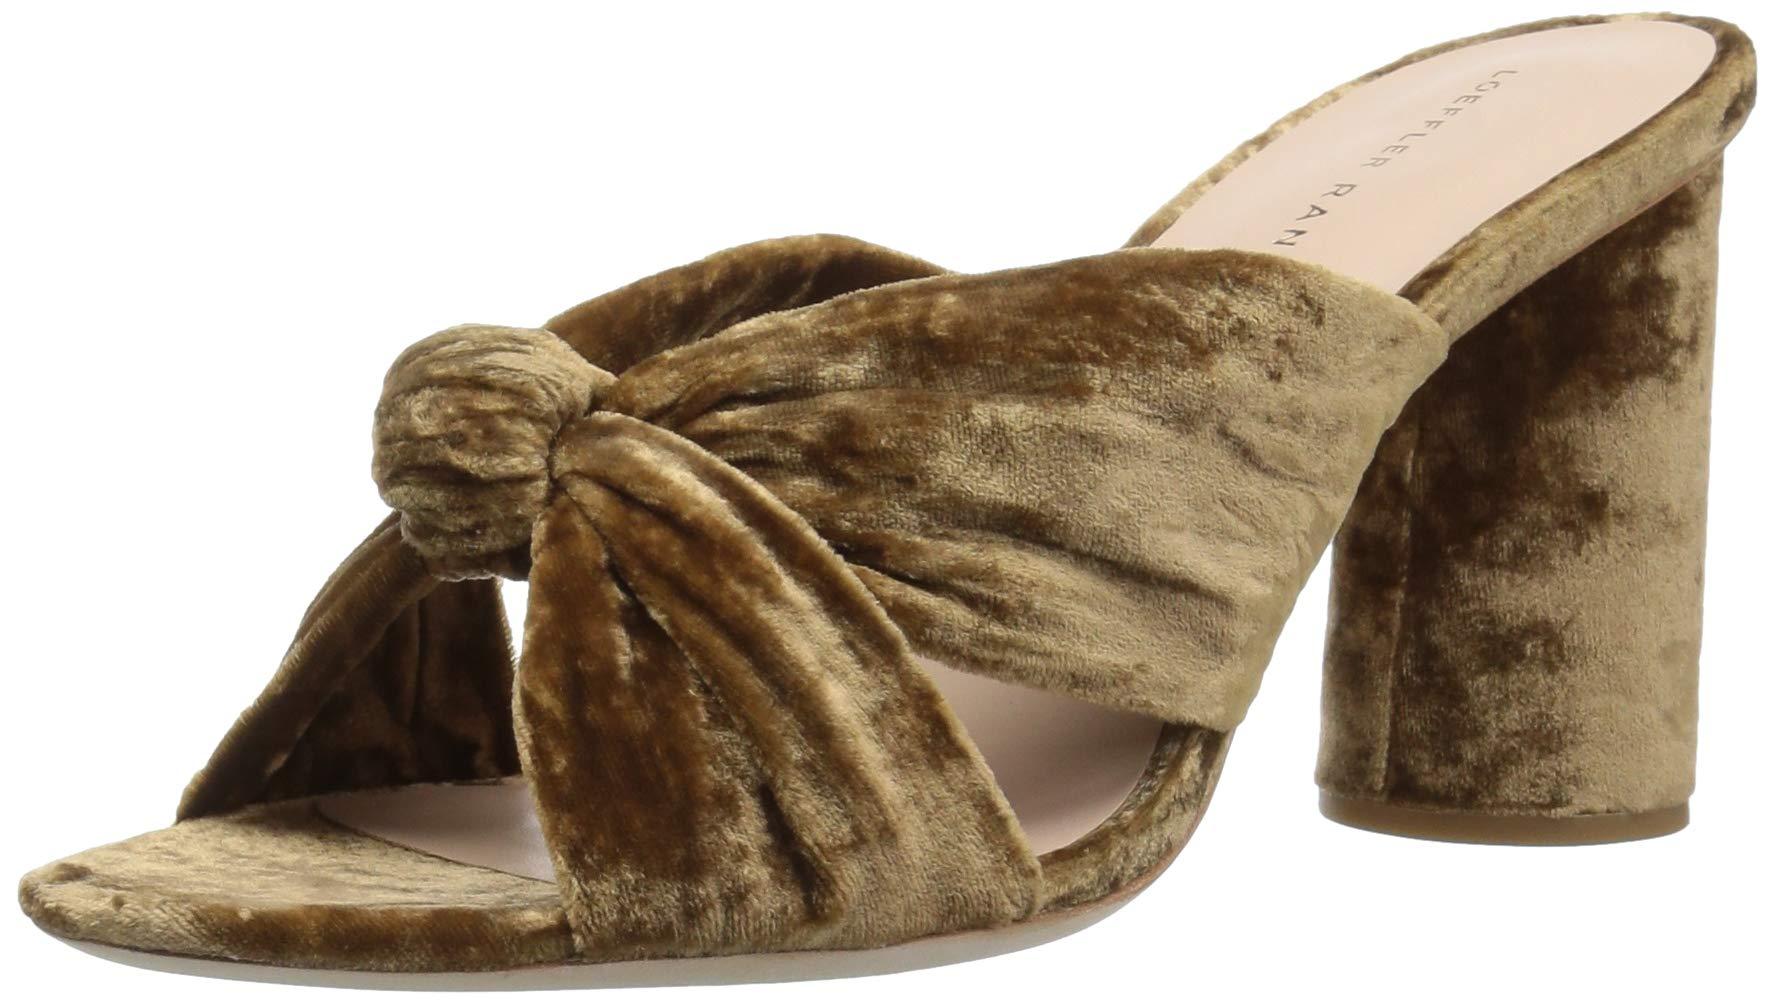 Loeffler Randall Women's Coco-vl Heeled Sandal